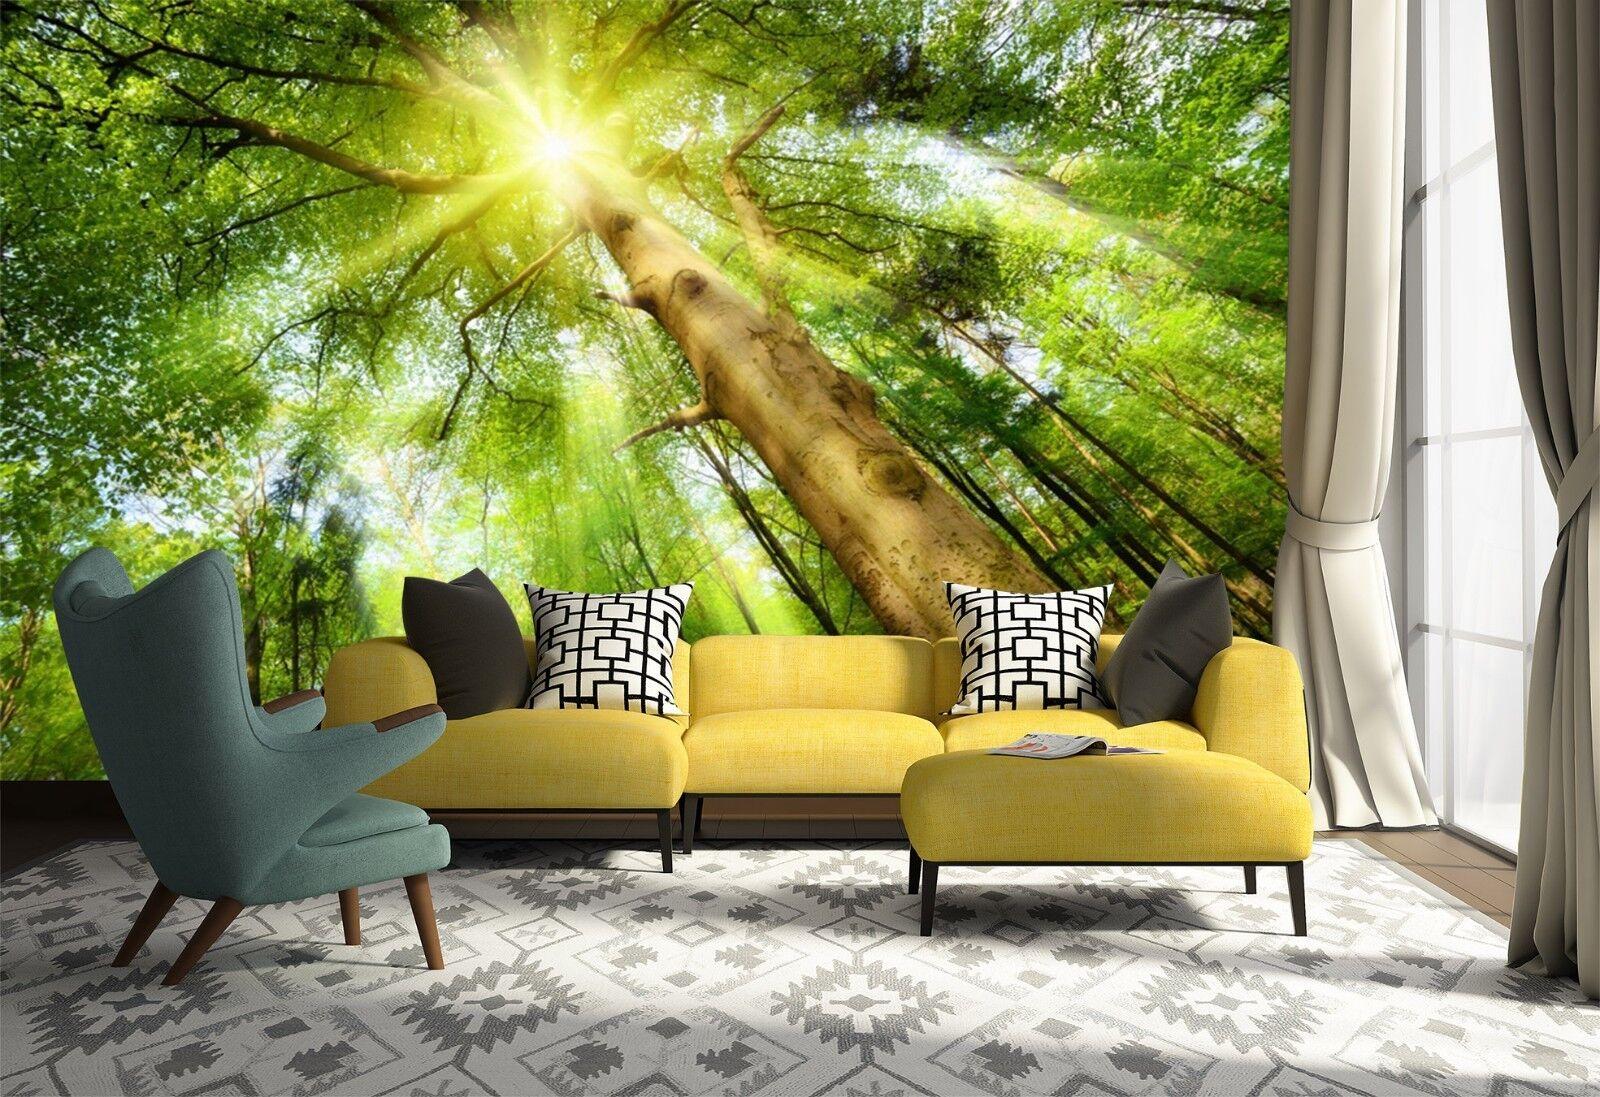 3D Tree Sunlight 7084 Wallpaper Mural Wall Print Wall Wallpaper Murals US Lemon